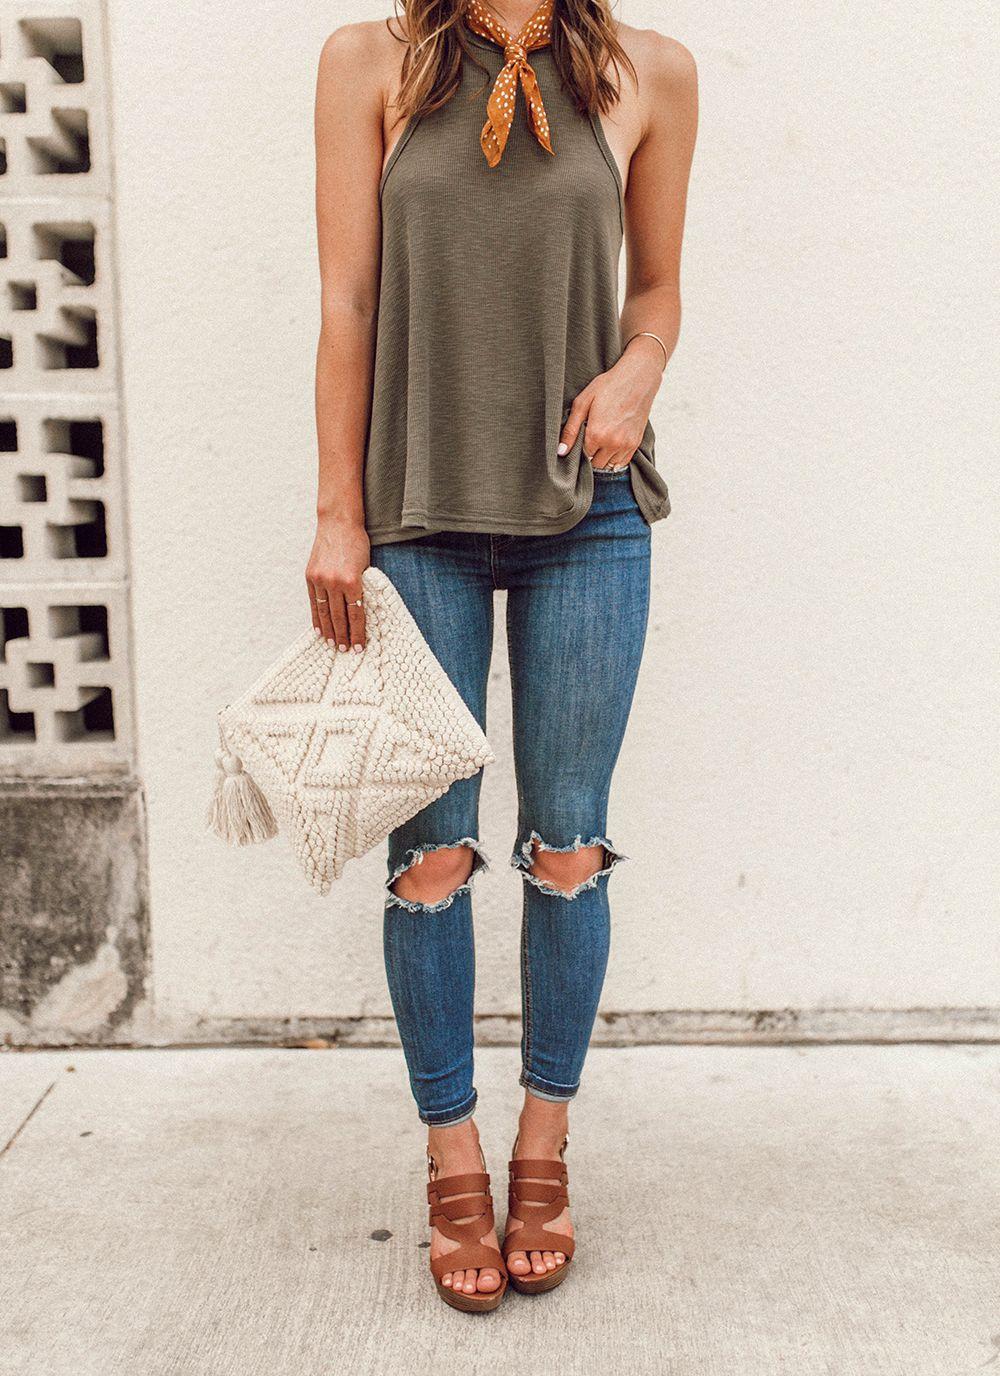 2dba9e549b0 livvyland-blog-olivia-watson-austin-texas-fashion-style-blogger -sole-society-tan-sandal-wedges-7